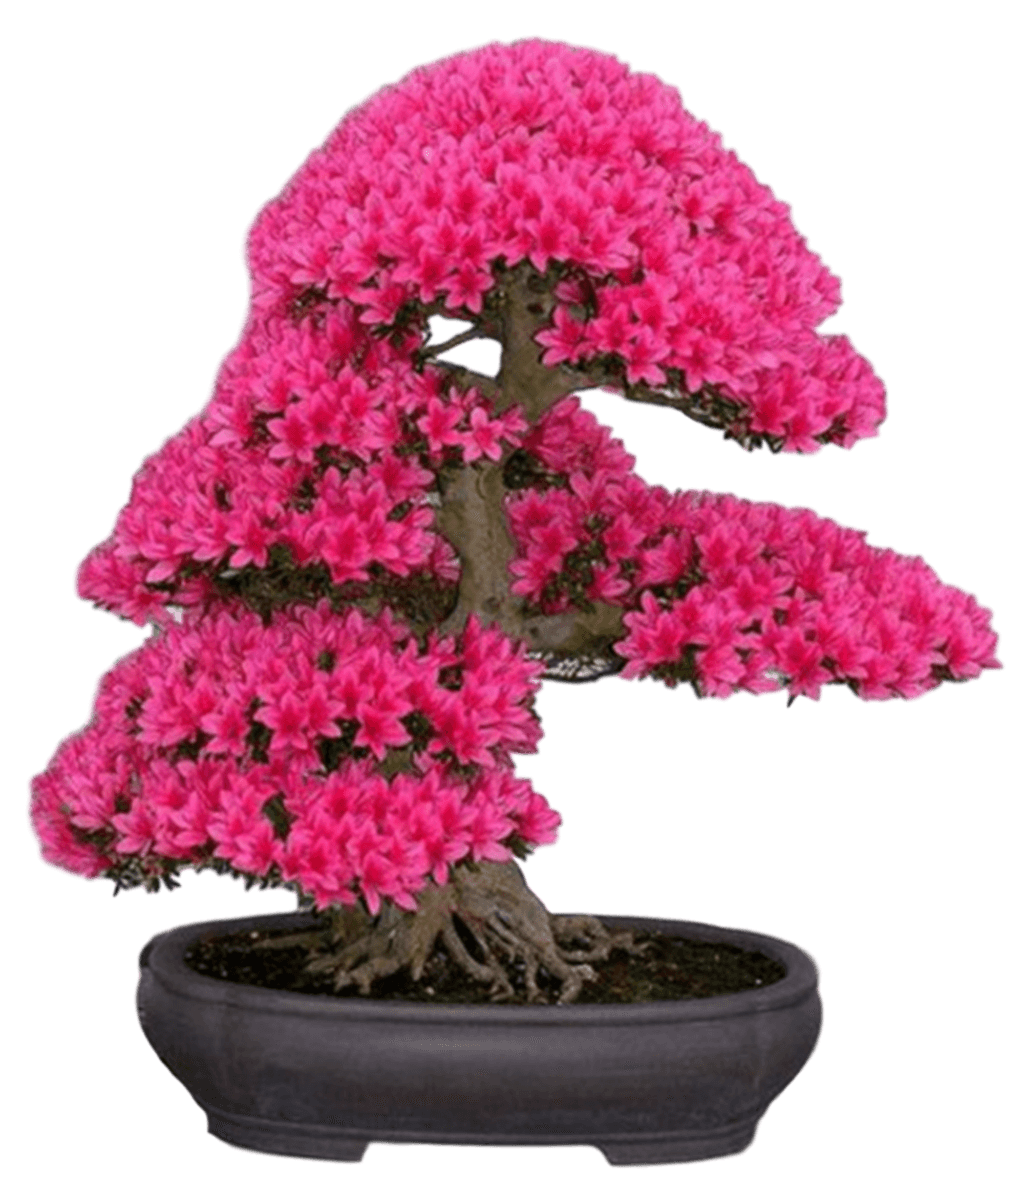 Japanese Cherry Blossom Seeds